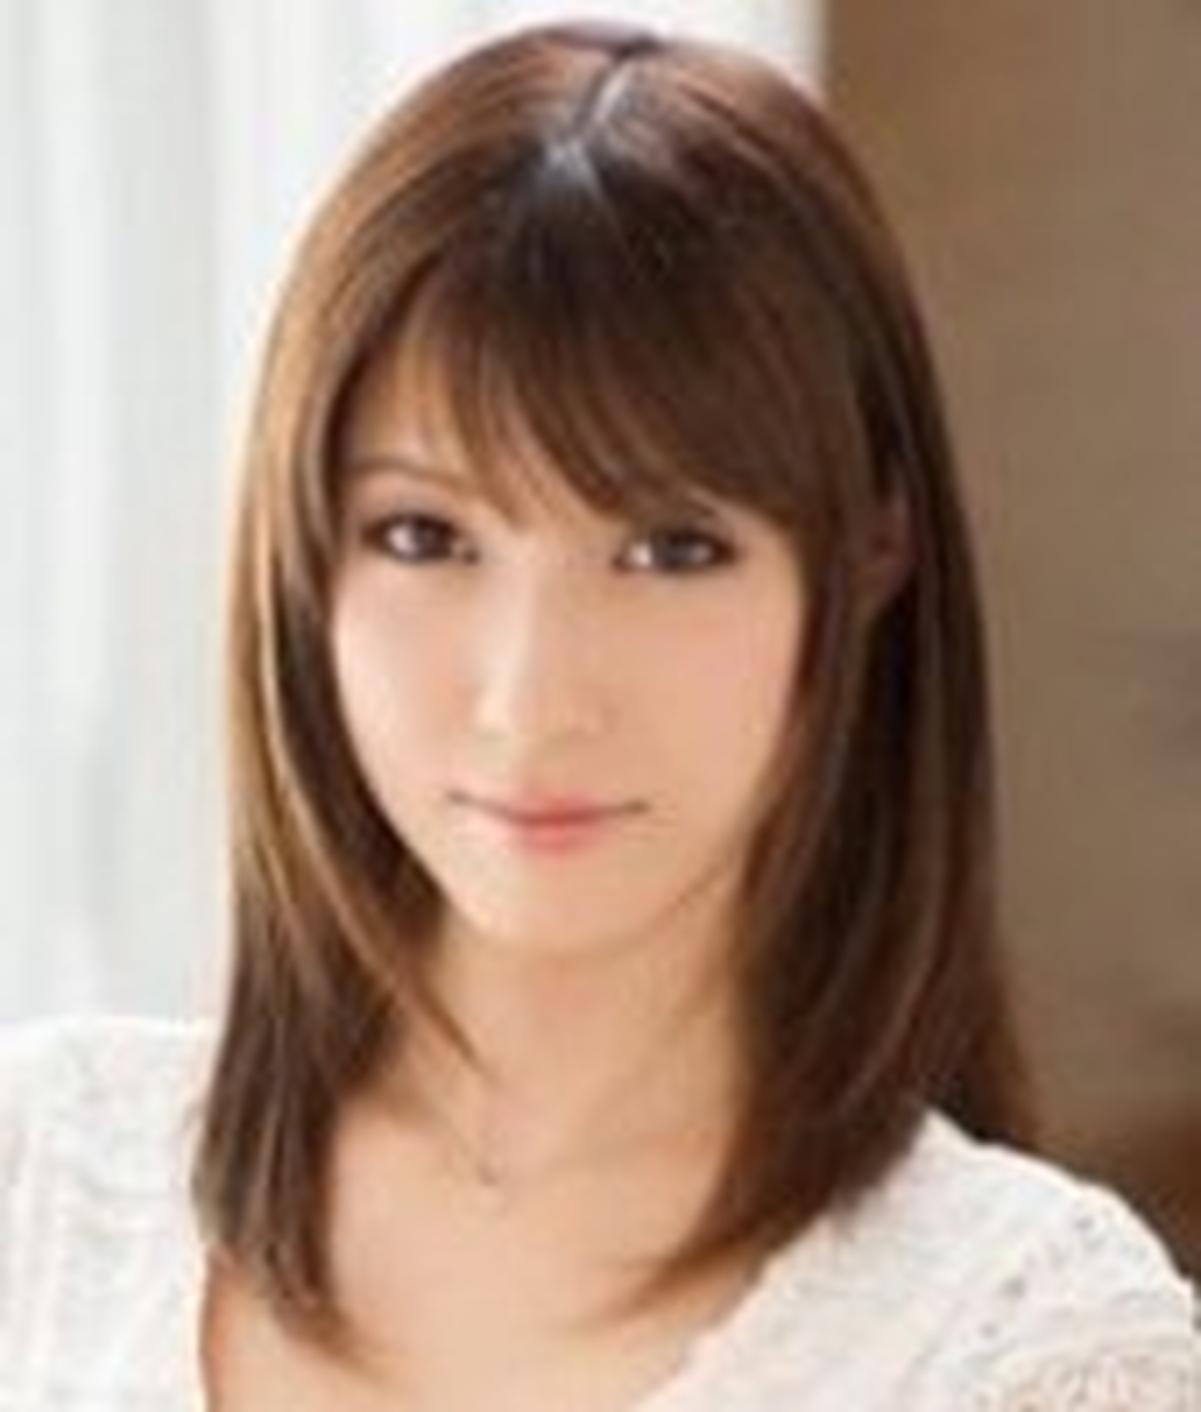 Kanako Iioka wiki, Kanako Iioka bio, Kanako Iioka news